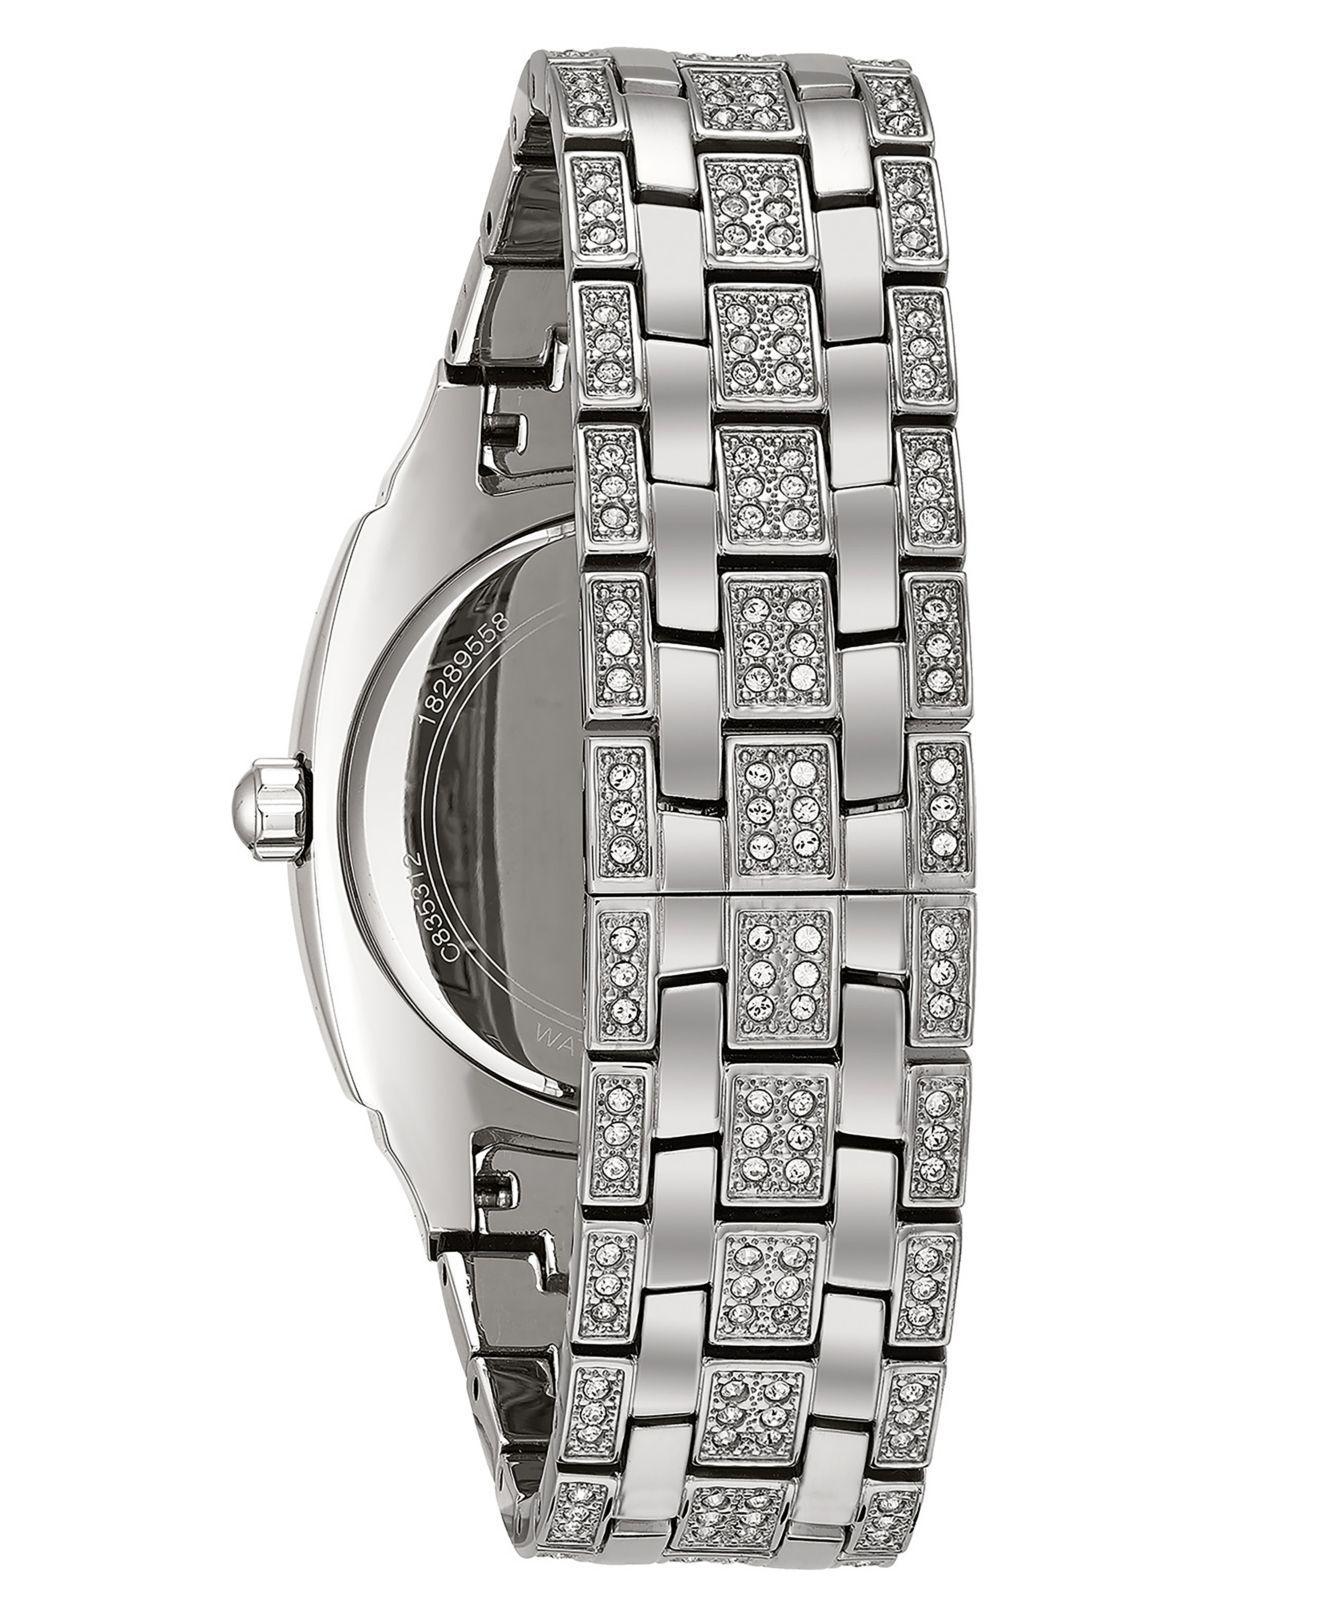 5c6d35e375afc Metallic Men's Crystal Accented Silver-tone Bracelet Watch 96c002